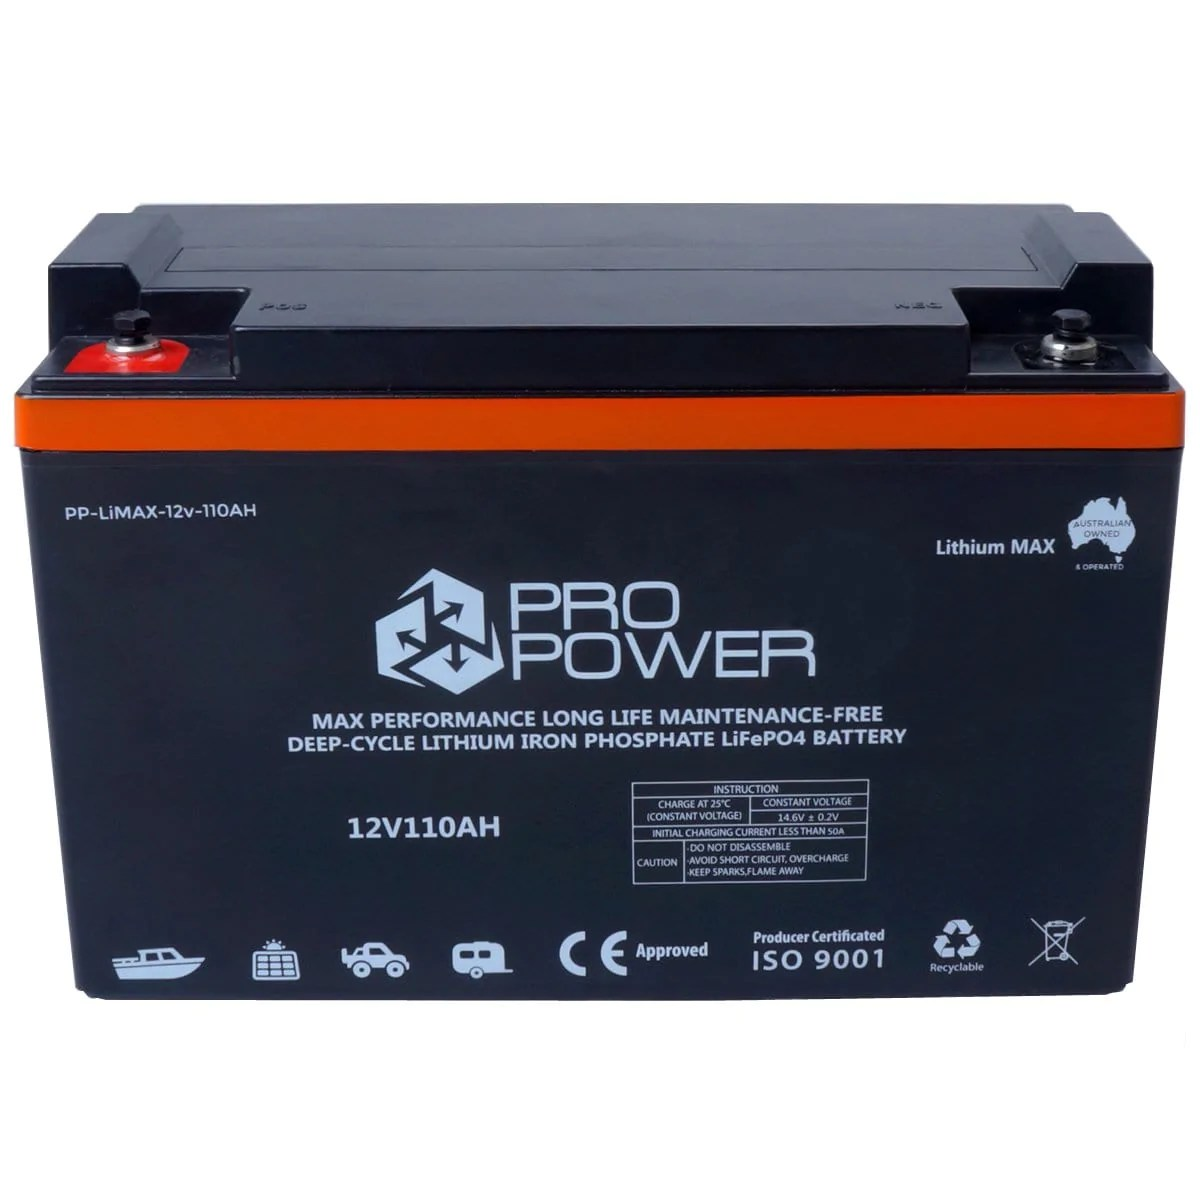 medium resolution of pro power 12v 110ah lithium iron lifepo4 deep cycle battery solar 4wd caravan